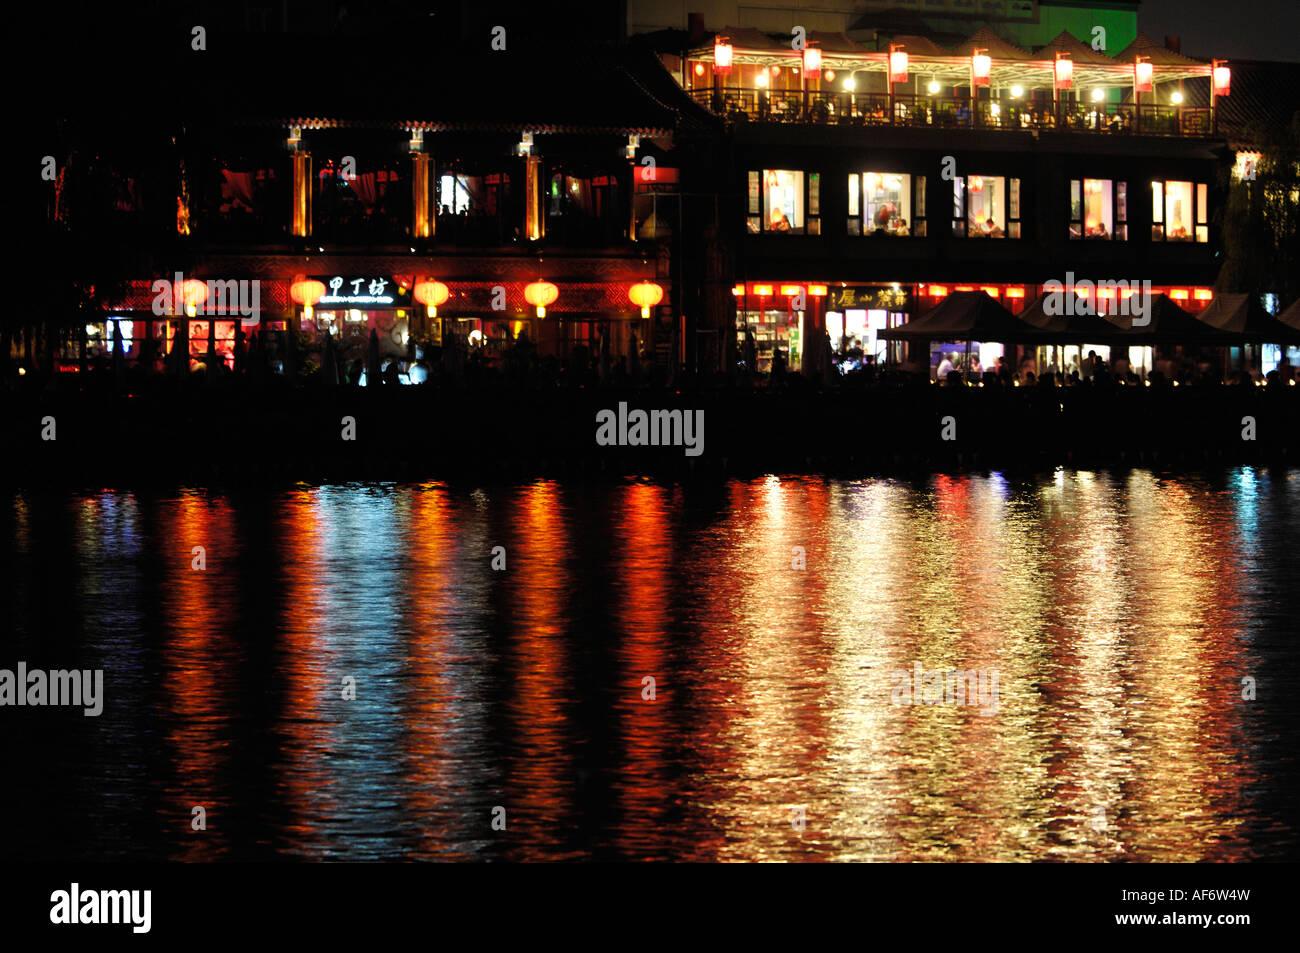 Lotus Lane a new area of trendy restaurants along Qianhai Lake Beijing China Sep 2007 - Stock Image